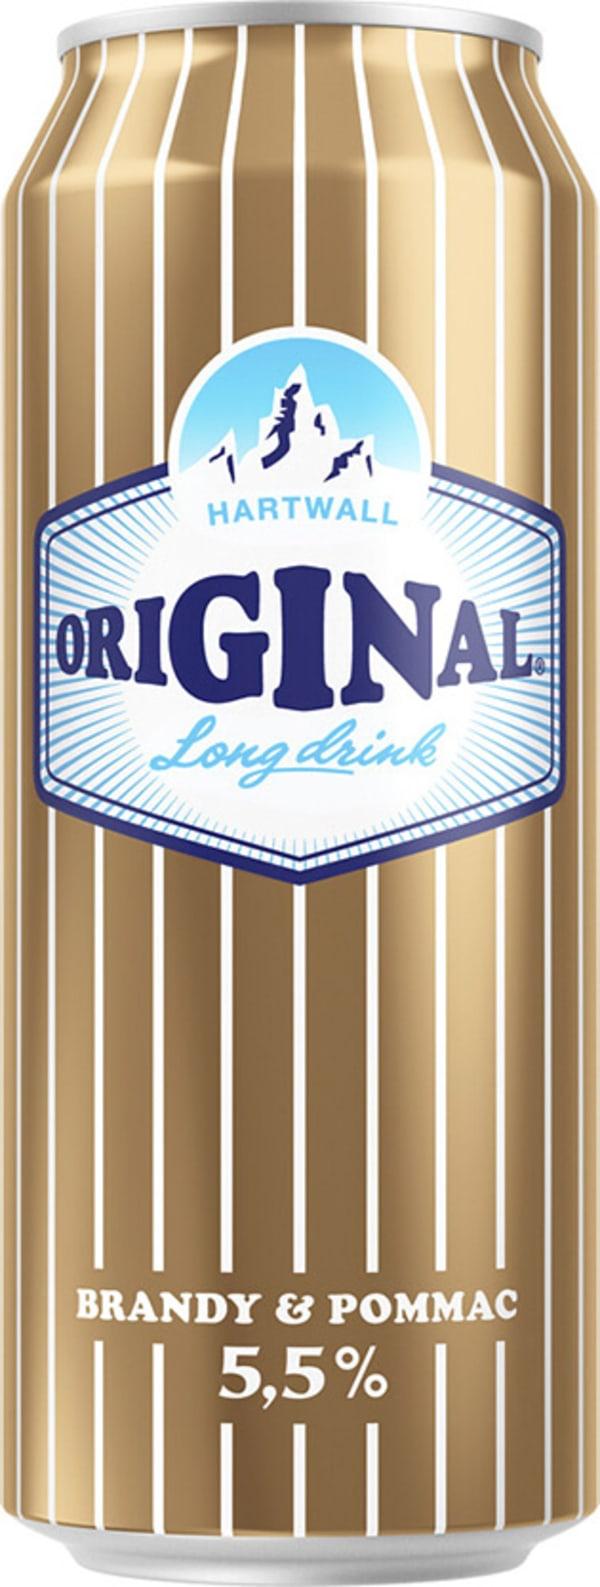 Original Long Drink Brandy & Pommac can